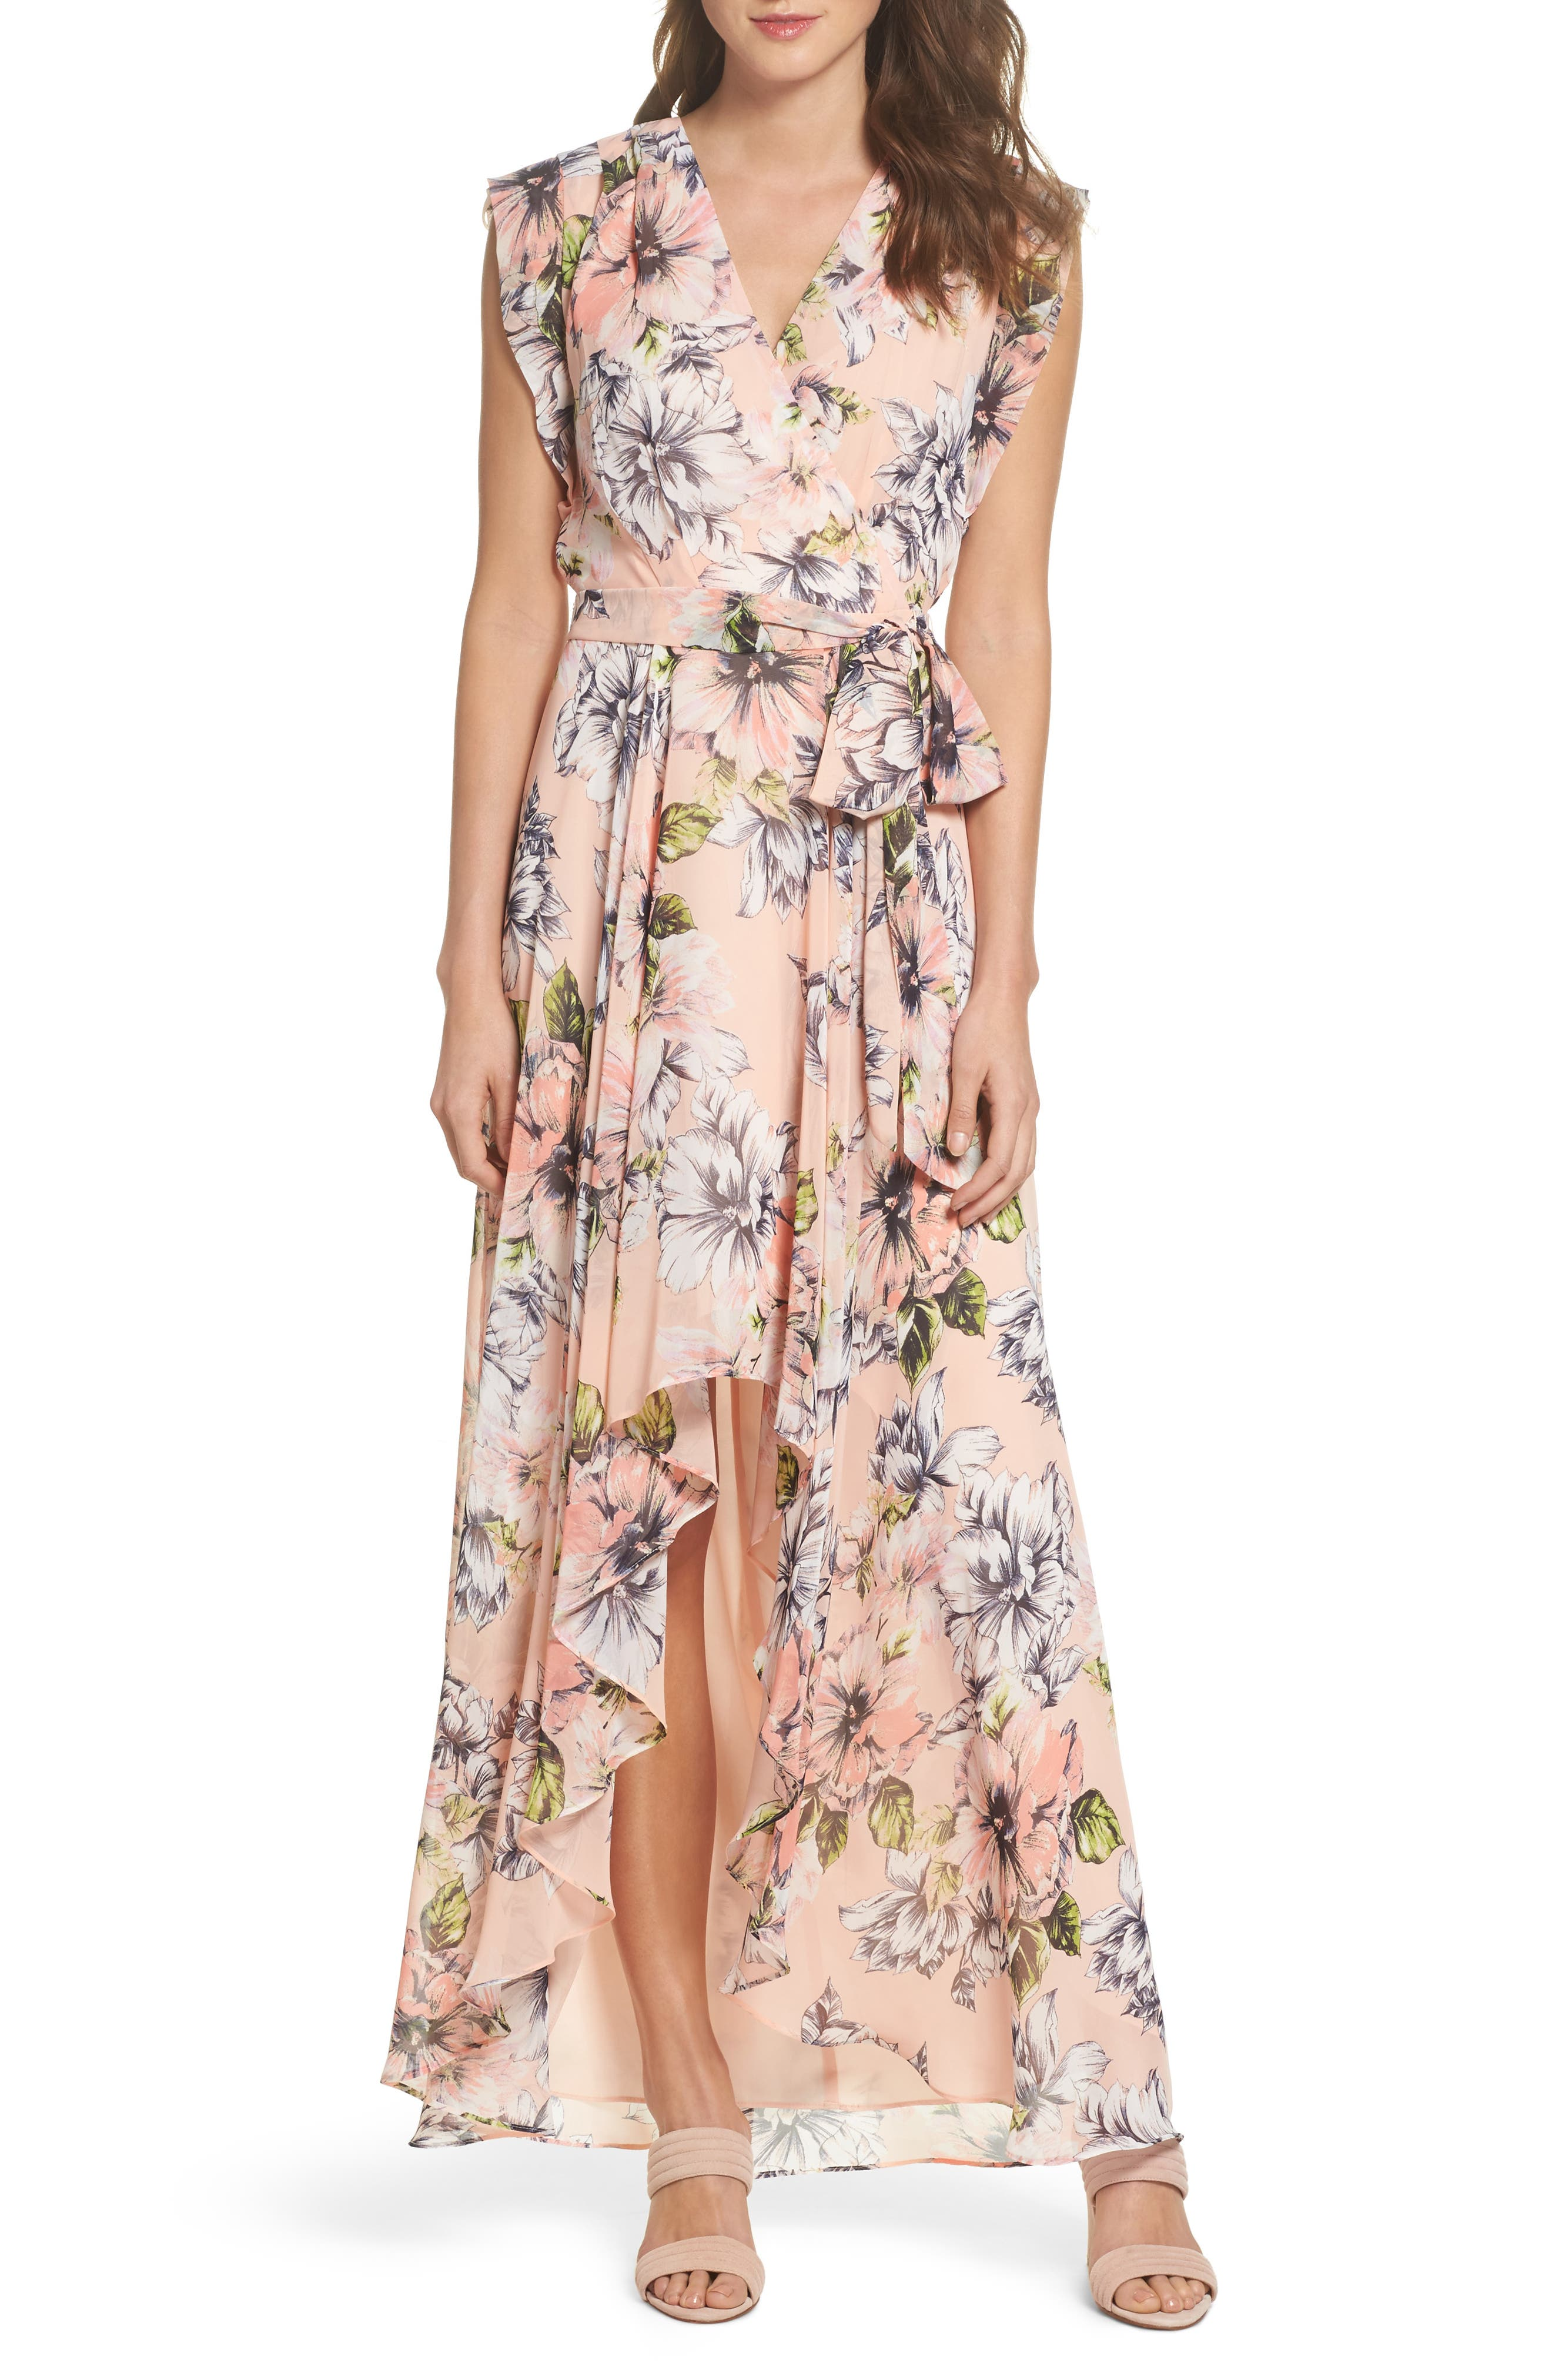 453eaca23f4 Women s High Low Dresses